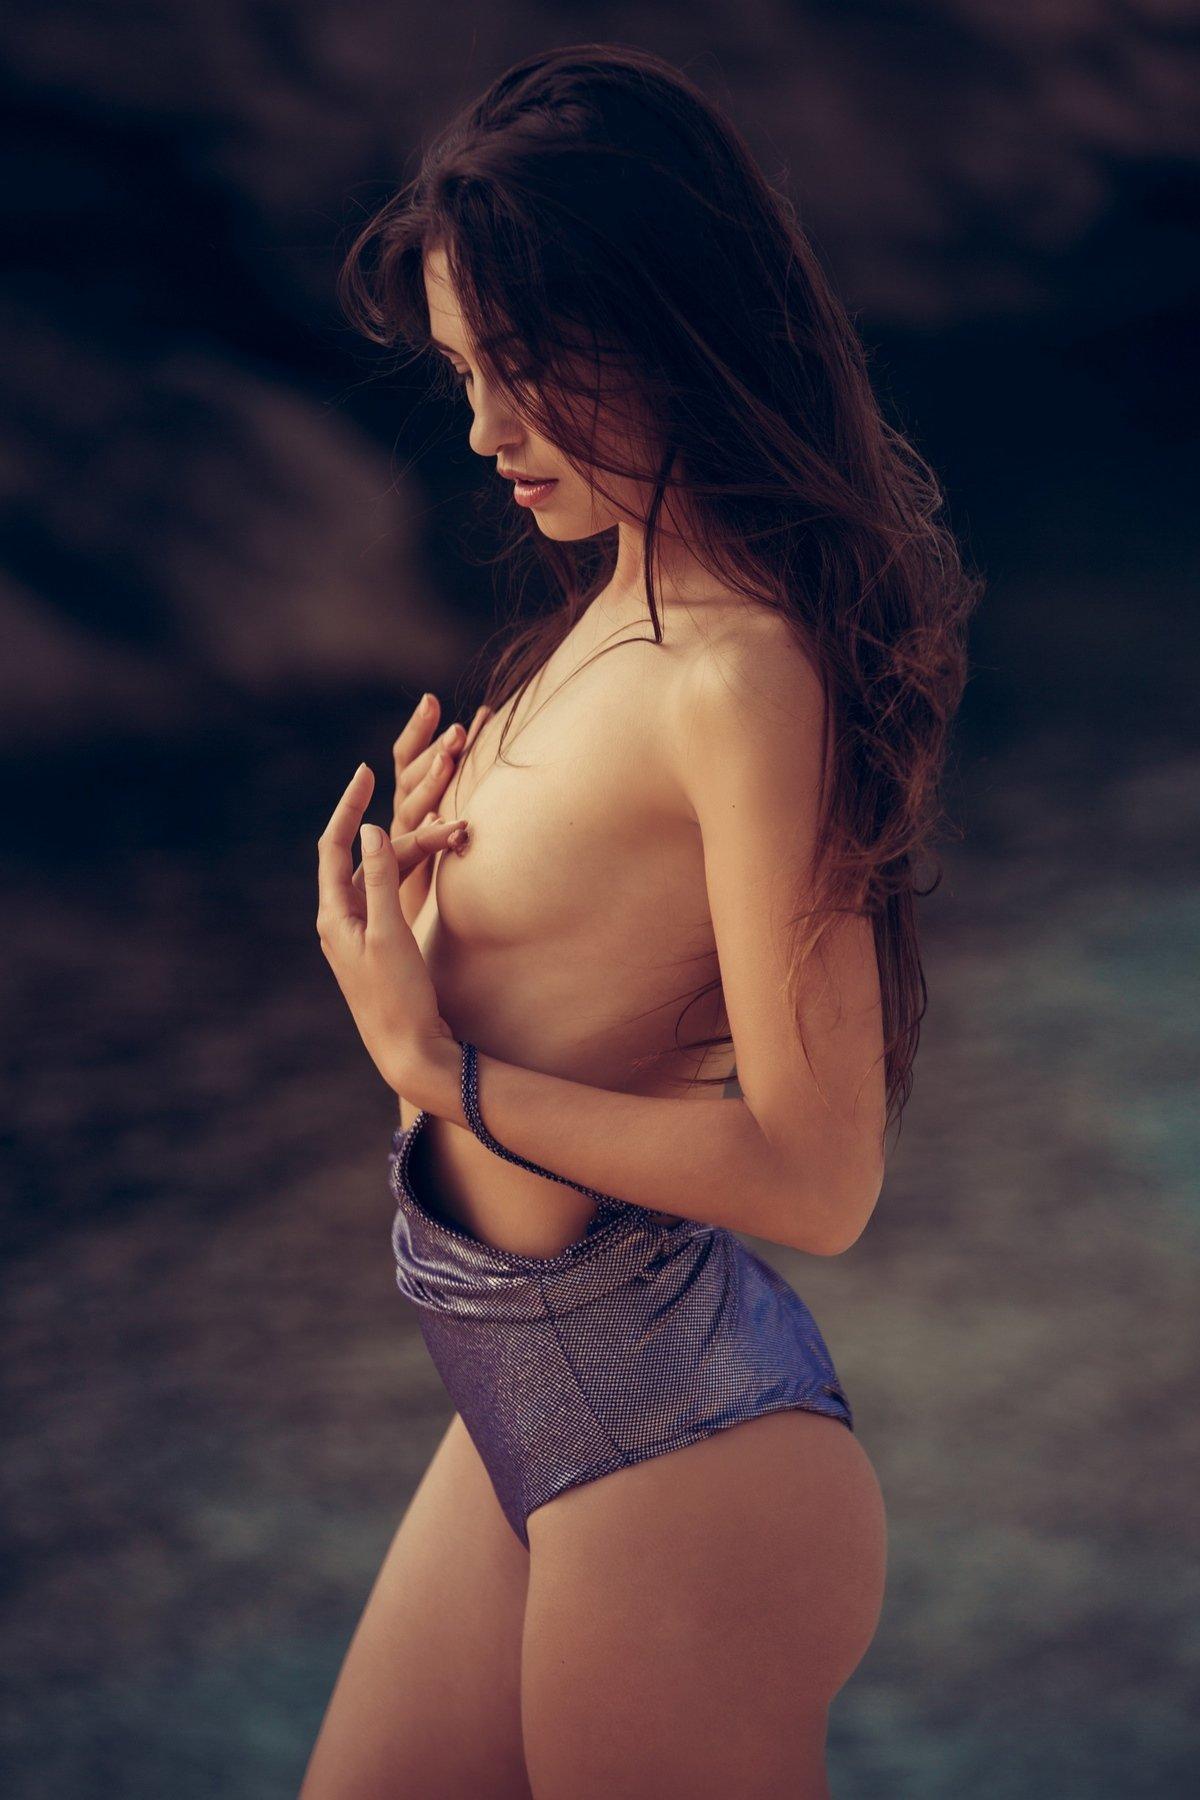 Эротика С Девушкой На Полянке Порно И Секс Фото С Брюнетками